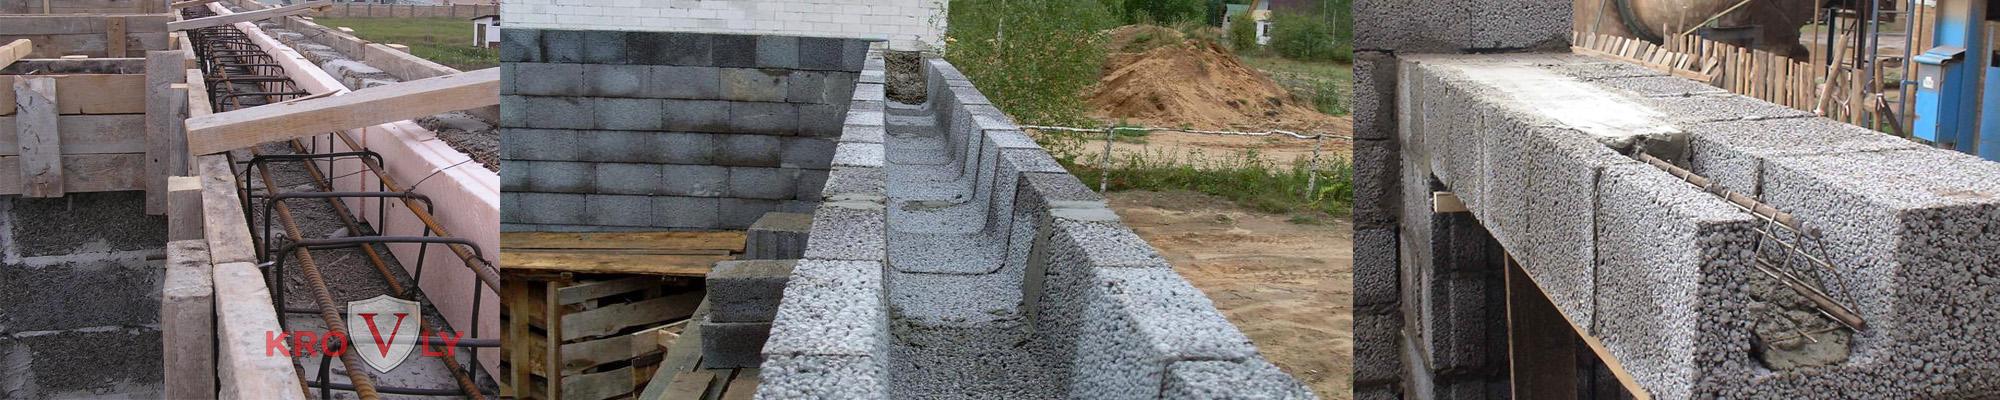 Армирование стен из шлакоблока, заливка армопояса